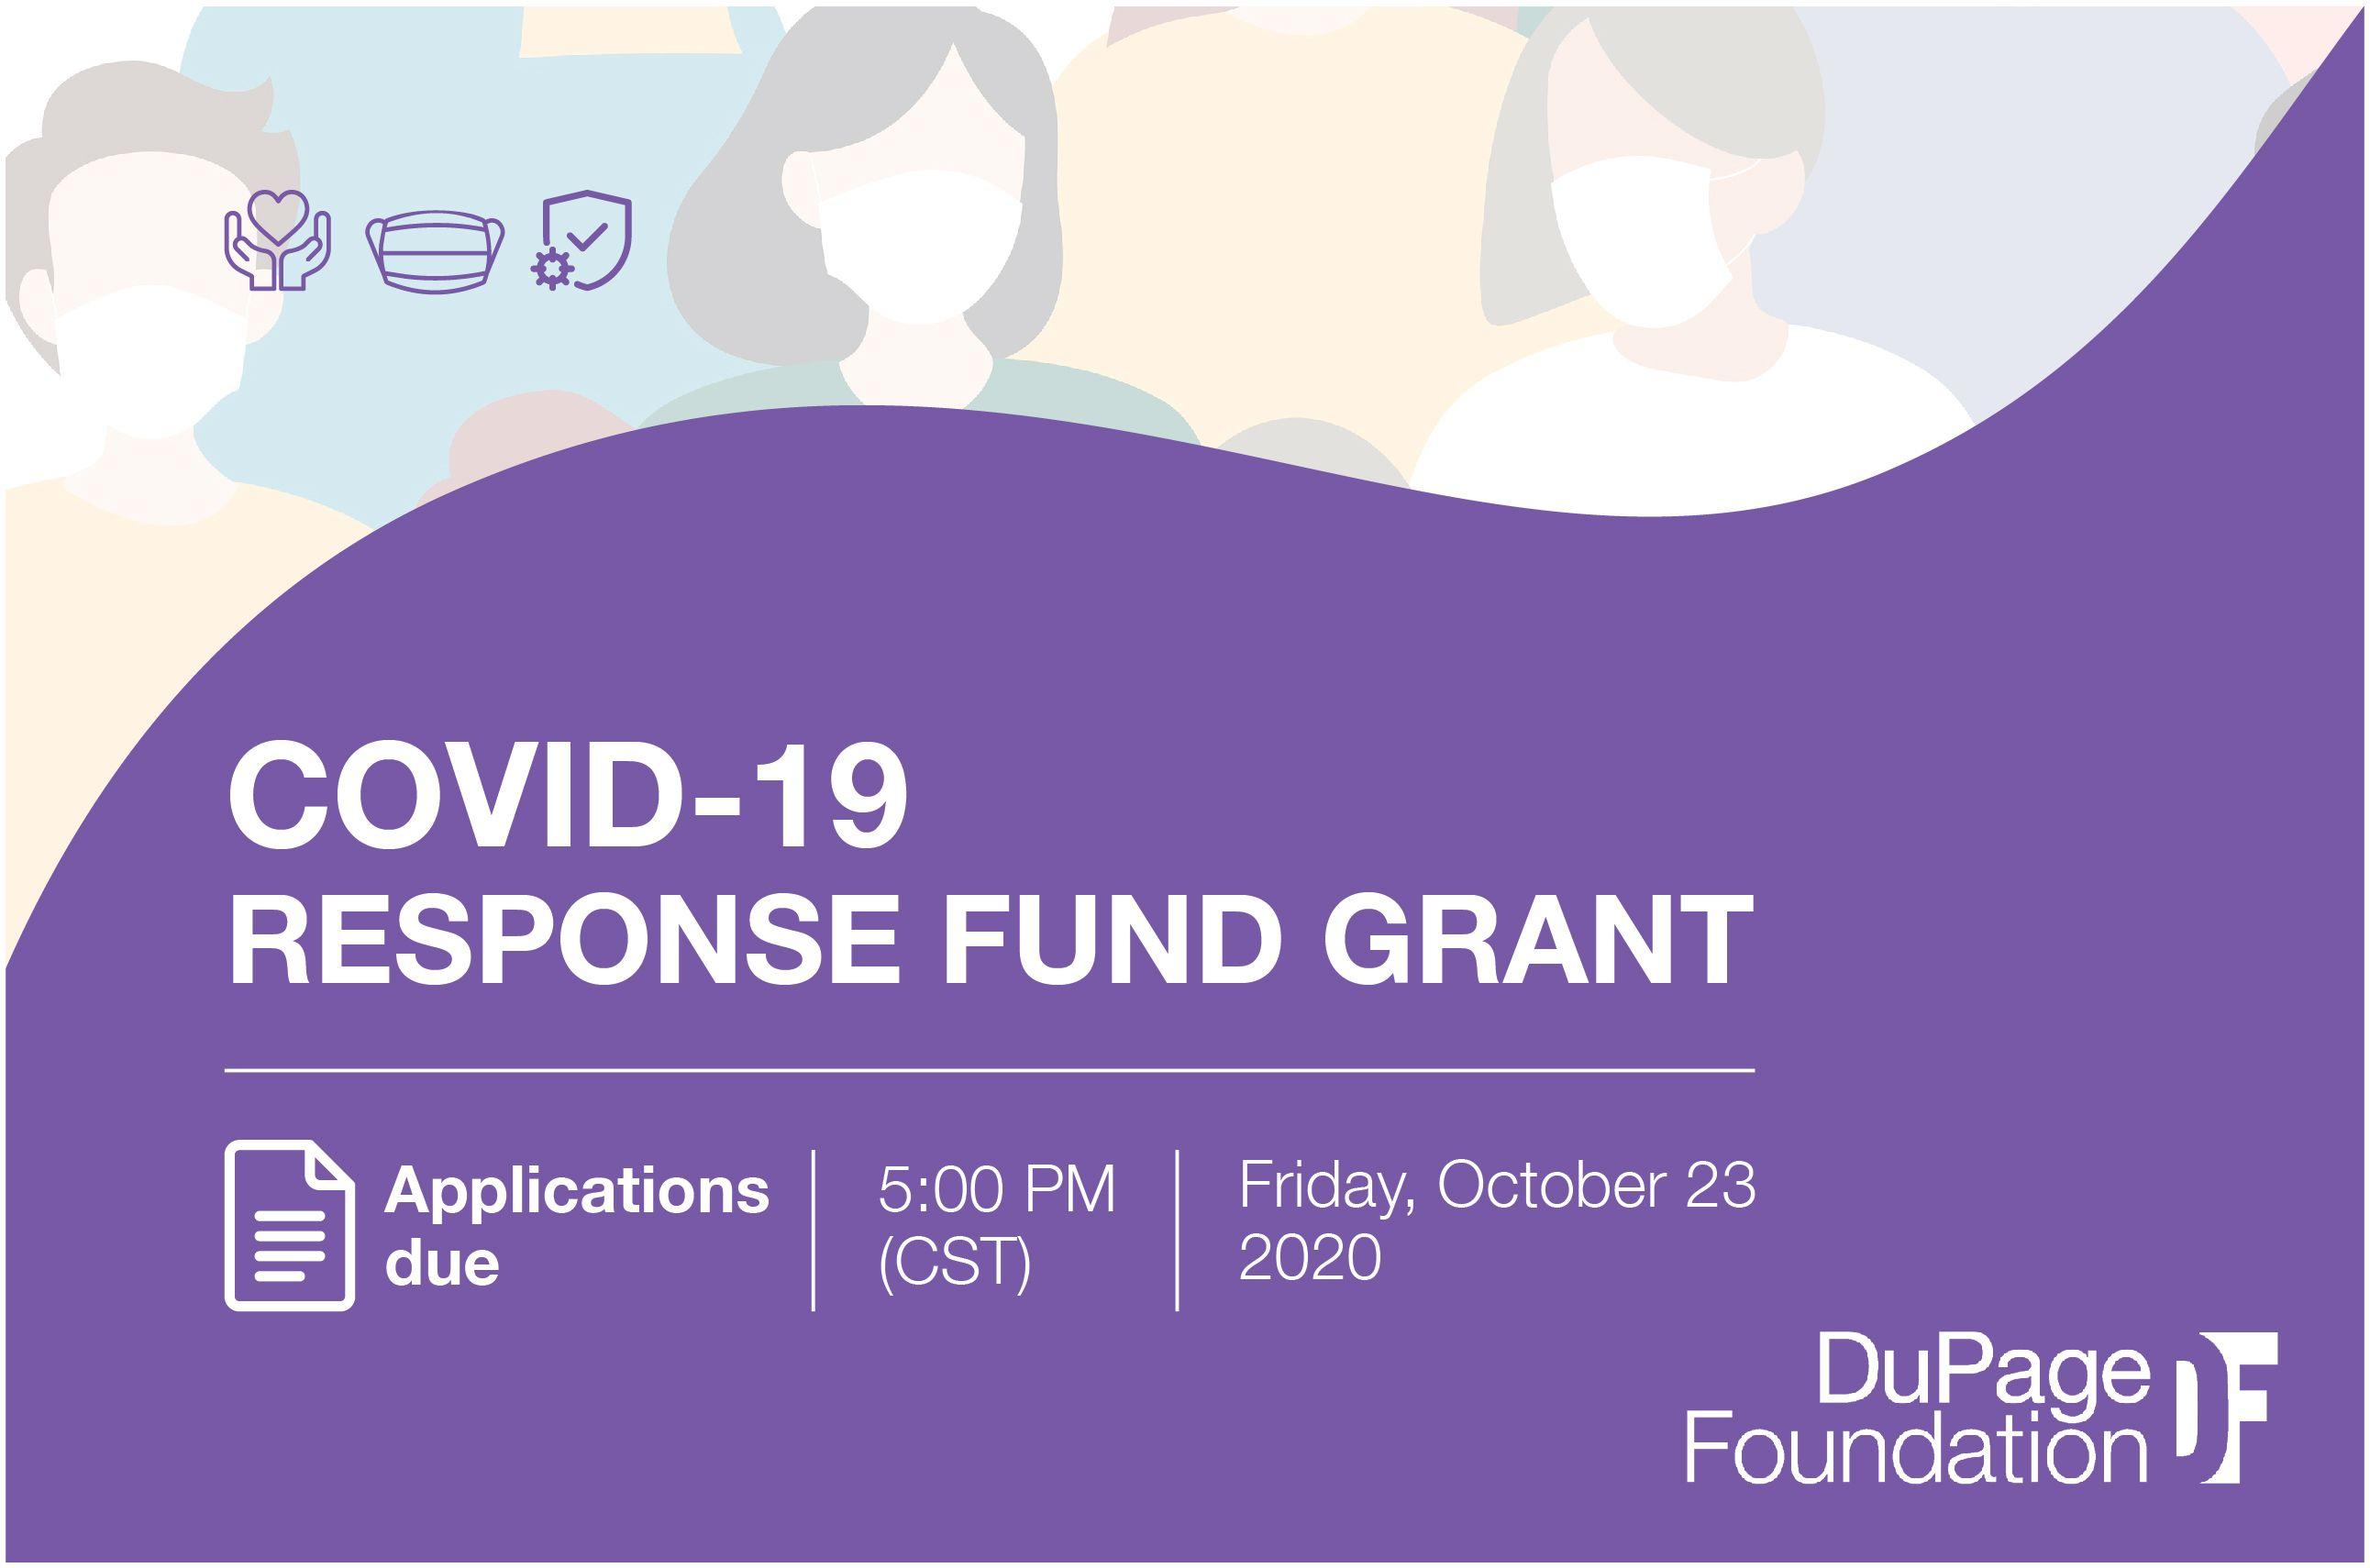 Applications Open Through Friday, October 23